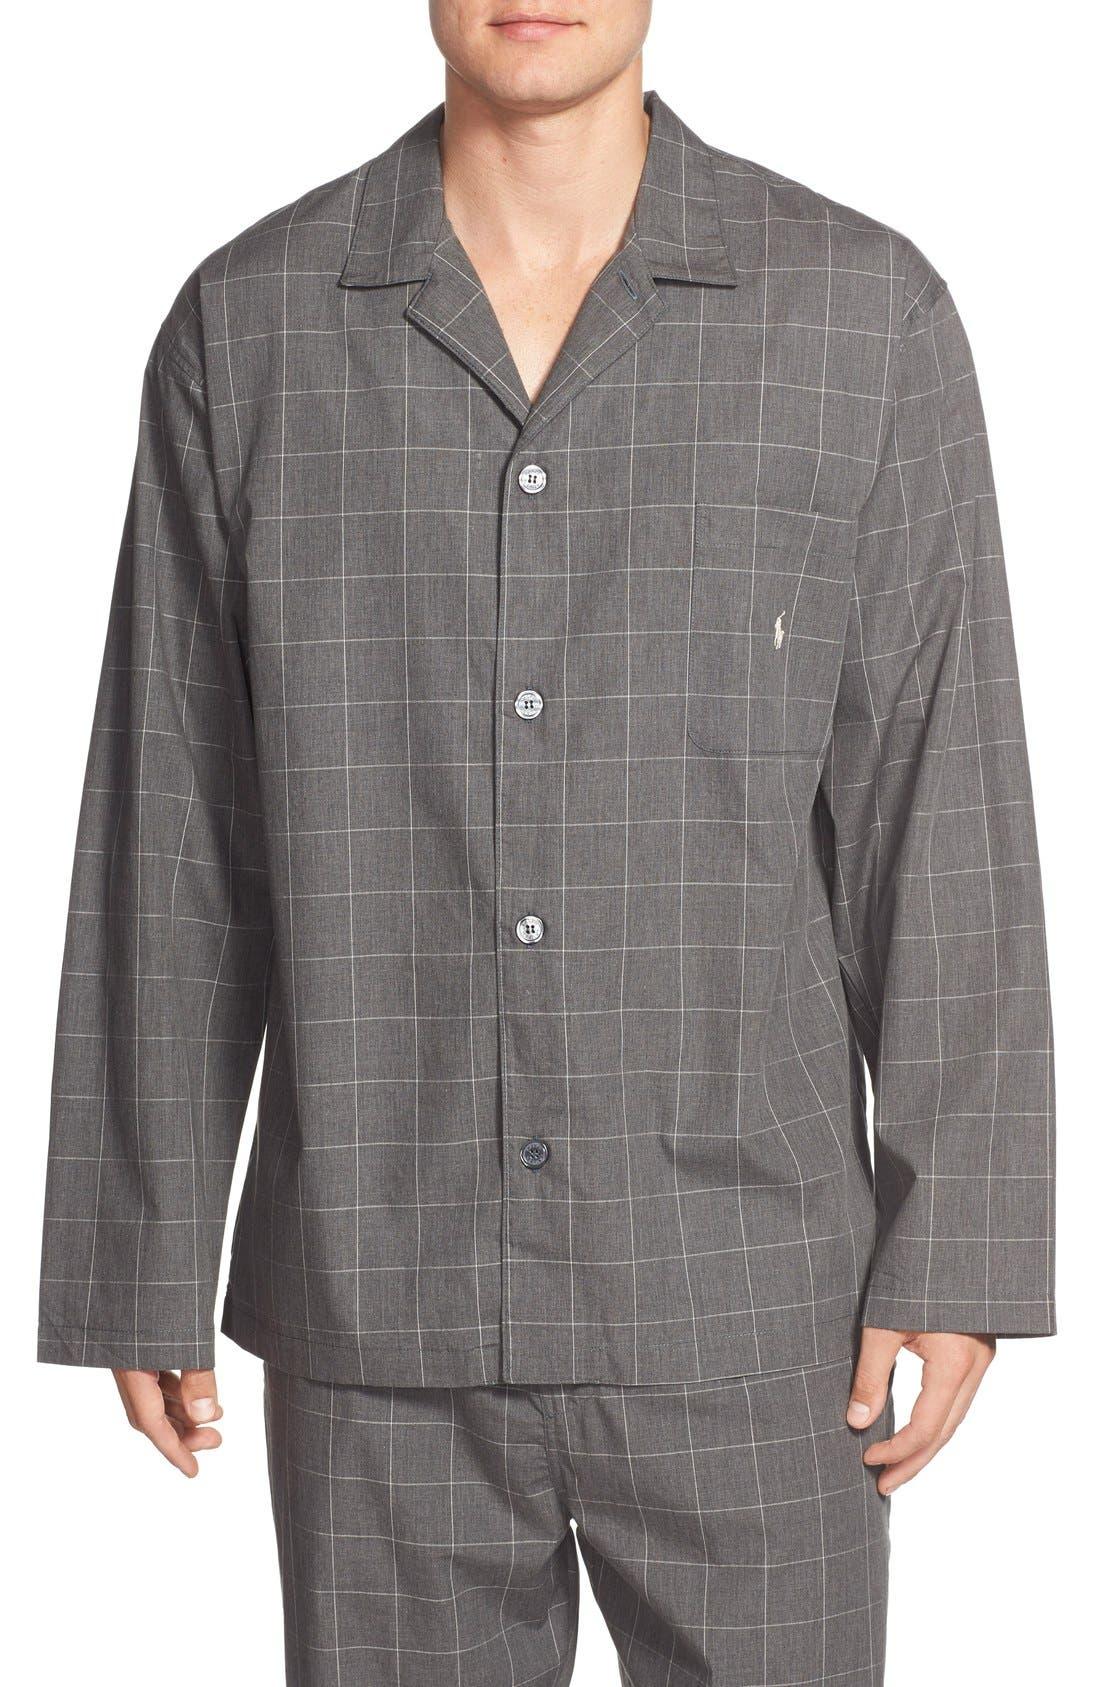 Woven Pajama Top,                         Main,                         color, Charcoal